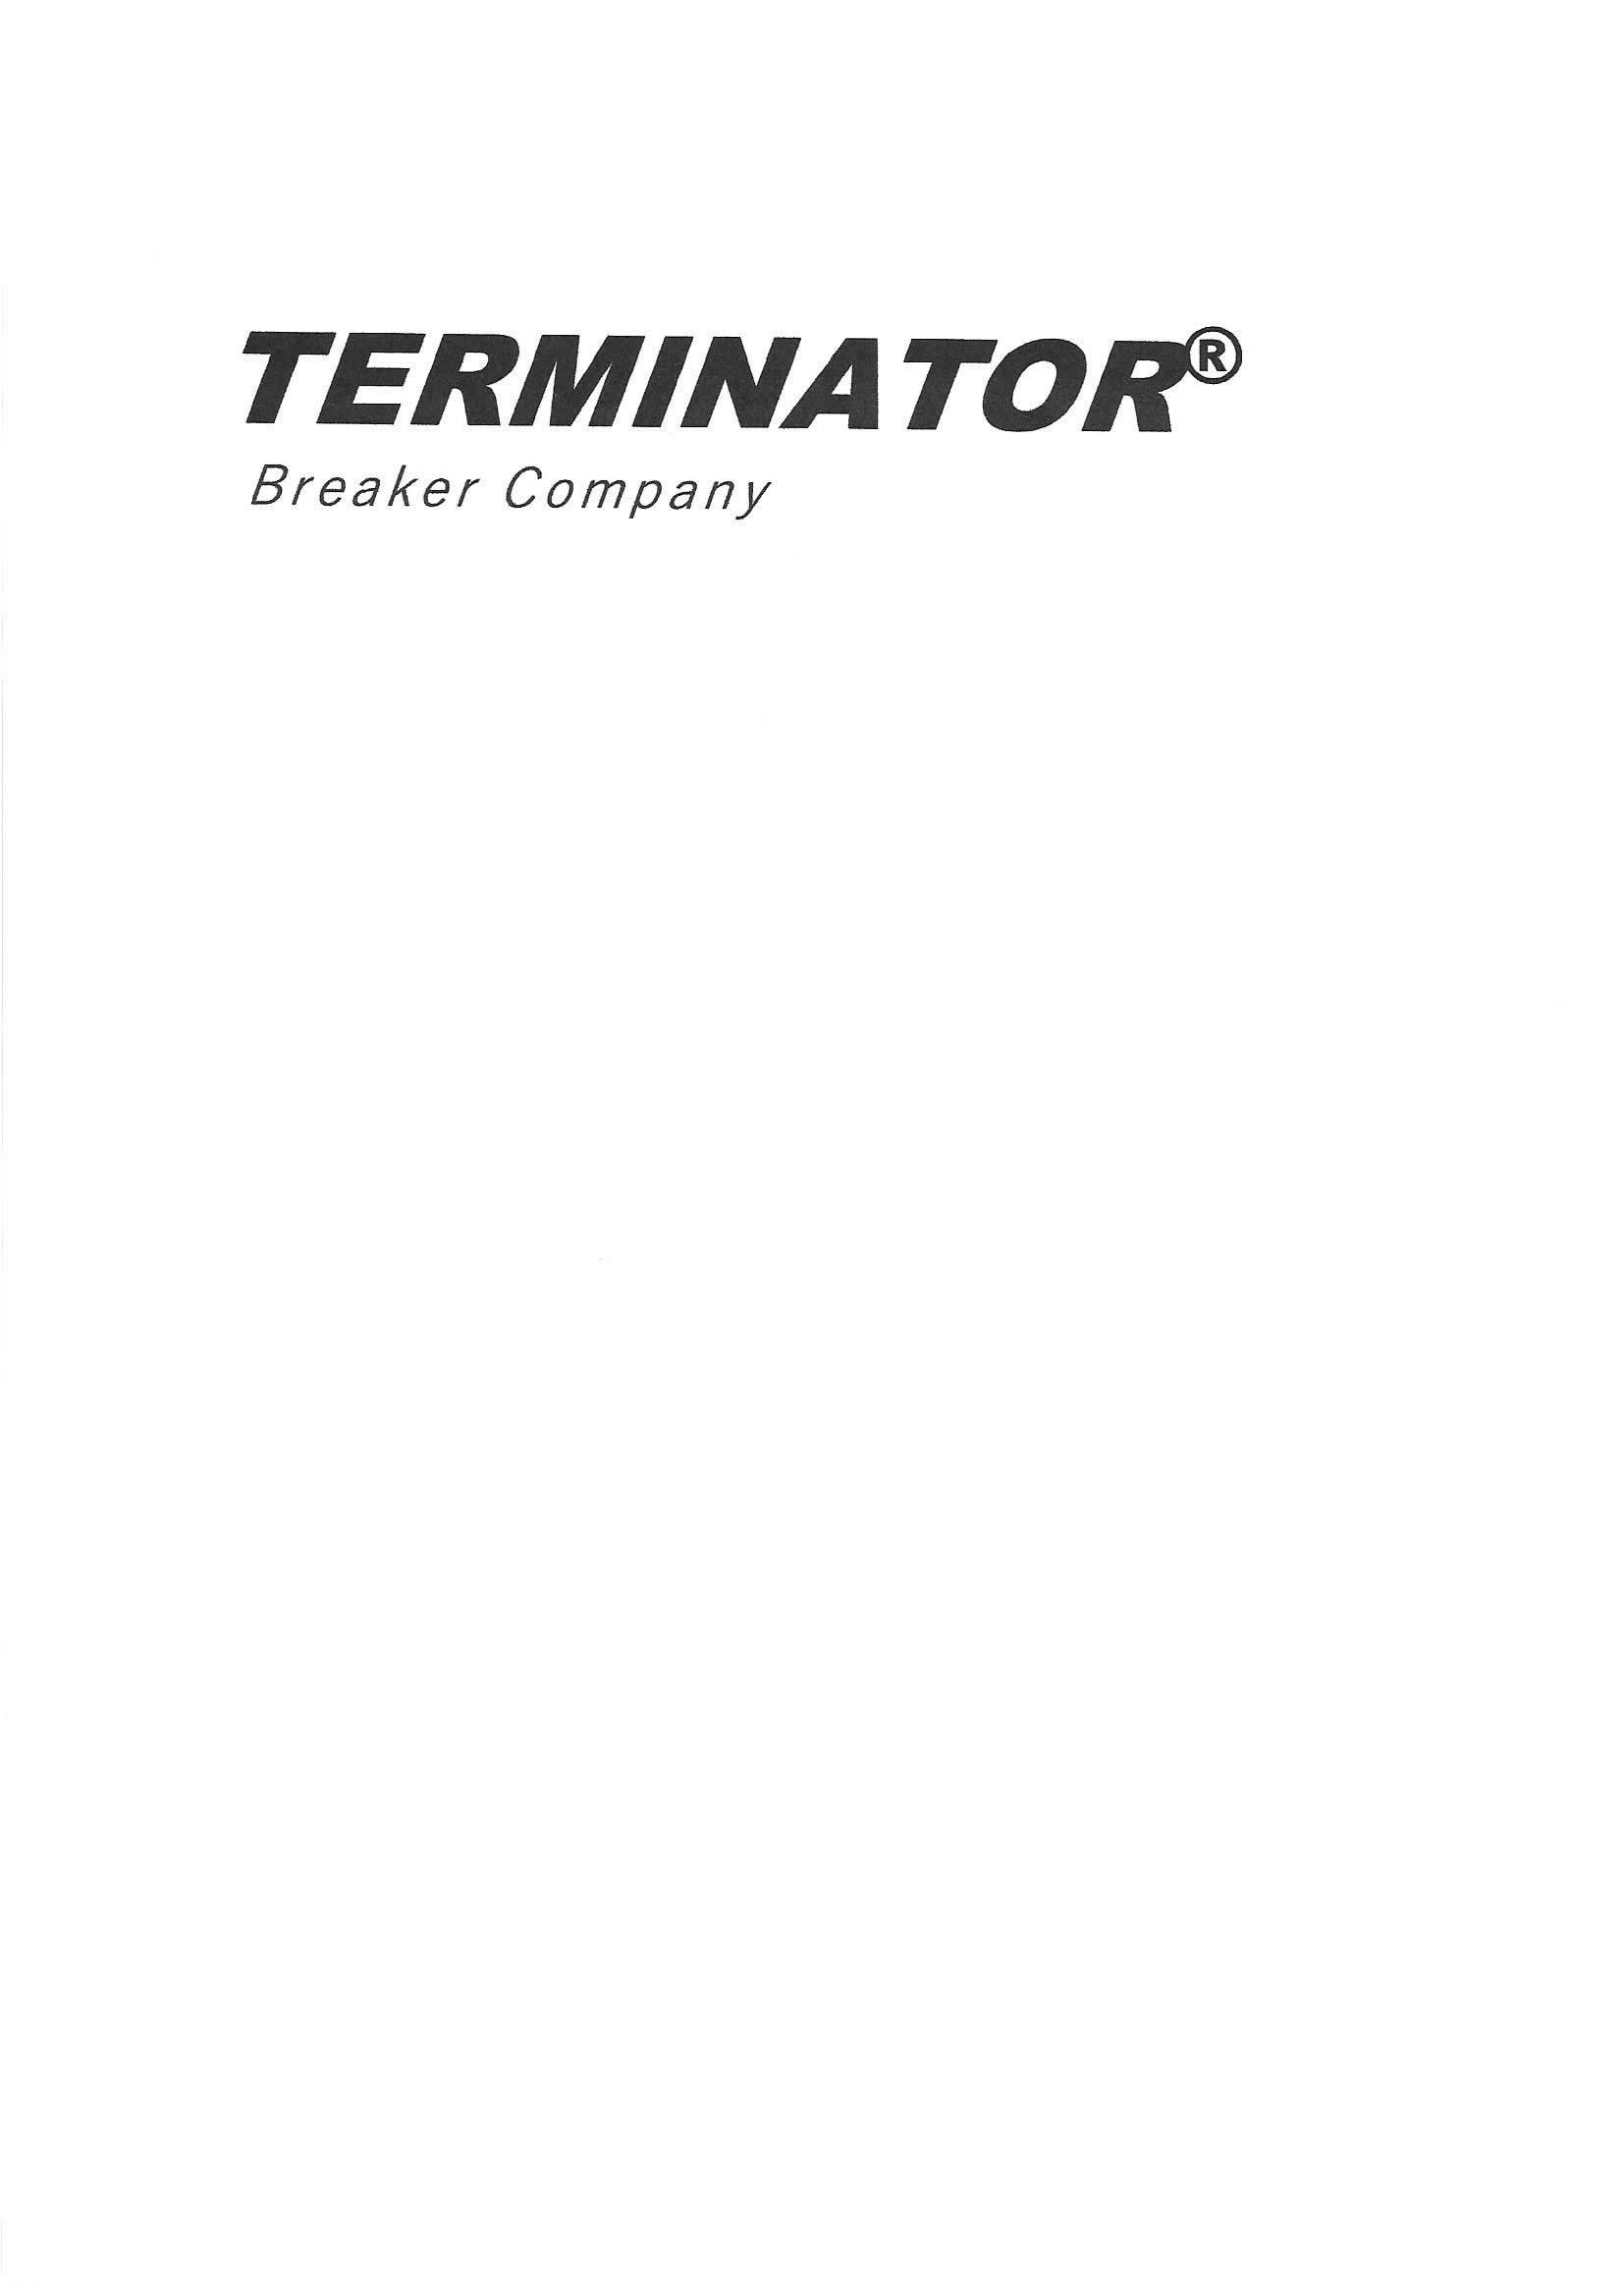 Terminator Breaker